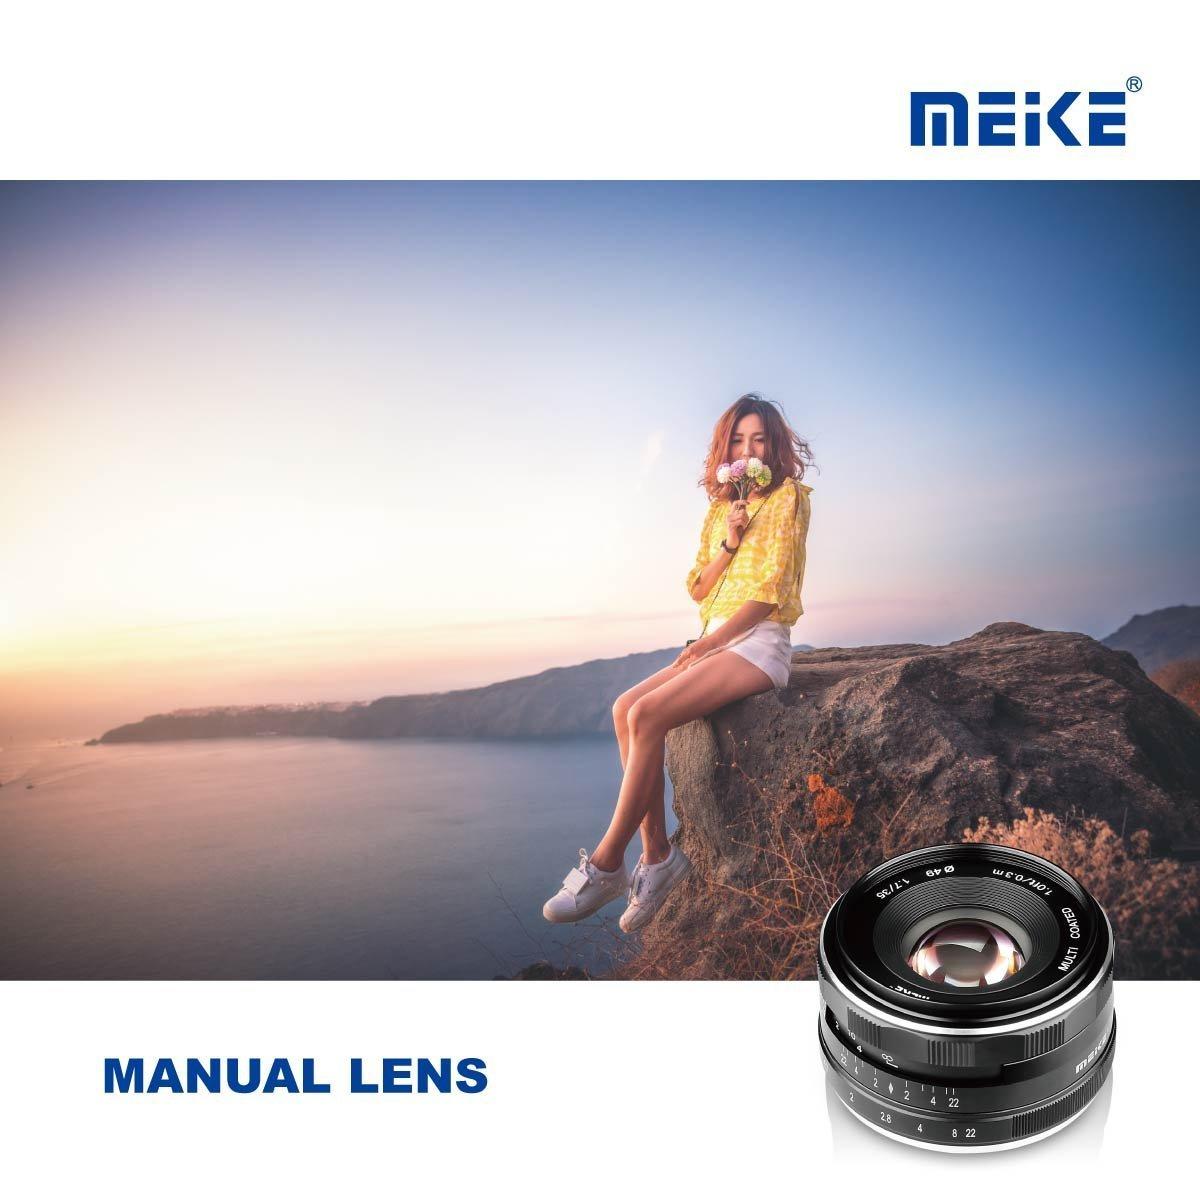 Meike 50mm F2.0 Large Aperture Manual Focus MF Fixed Lens for Sony E Mount A6000 A6100 A5000 A5100 A6300 A6500 NEX 3 3N Mirrorless Cameras